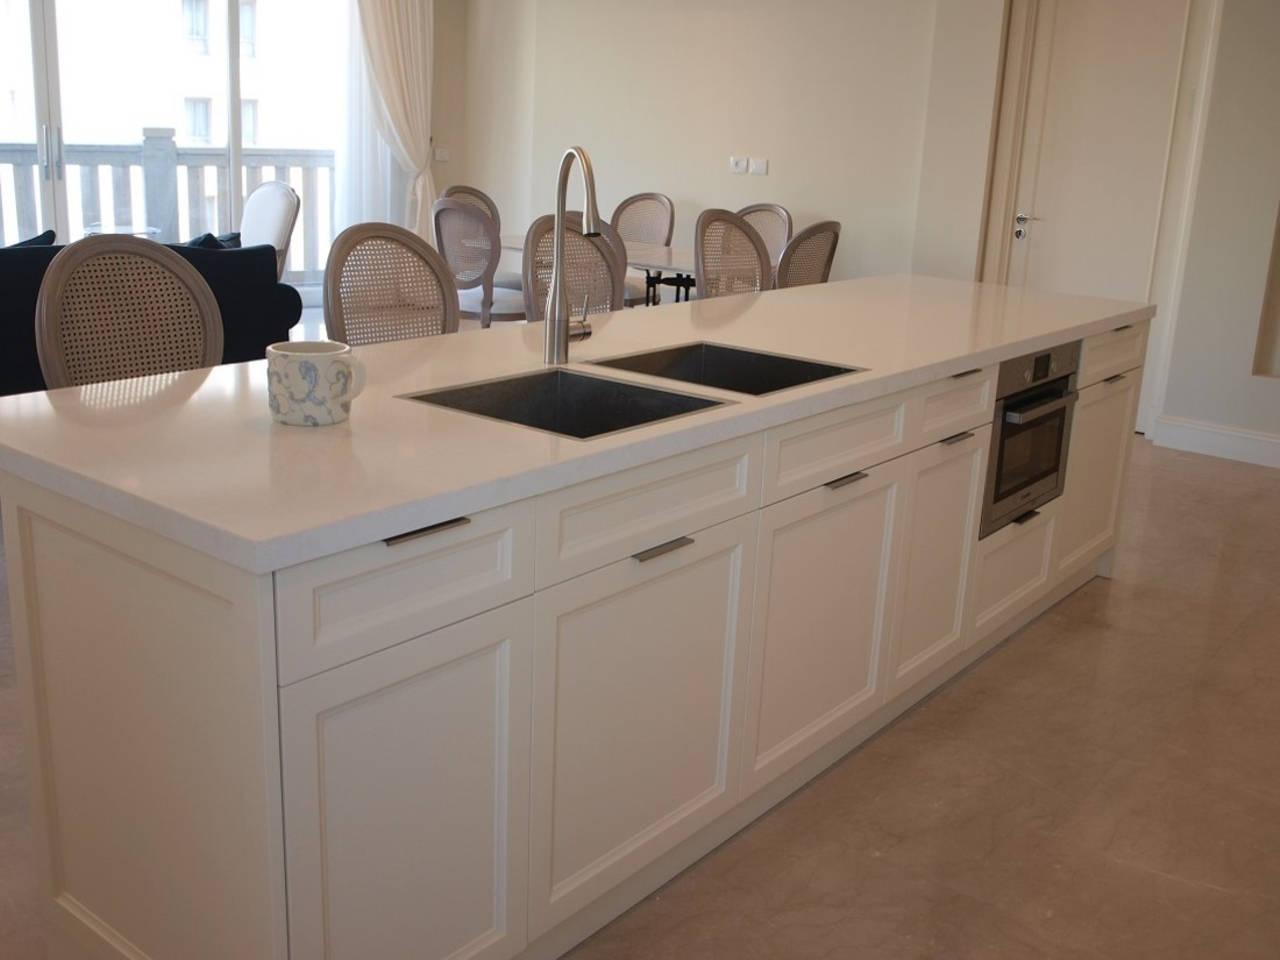 Apartment Great Location - Mamilla Mall Super Luxurious Flat photo 16708910